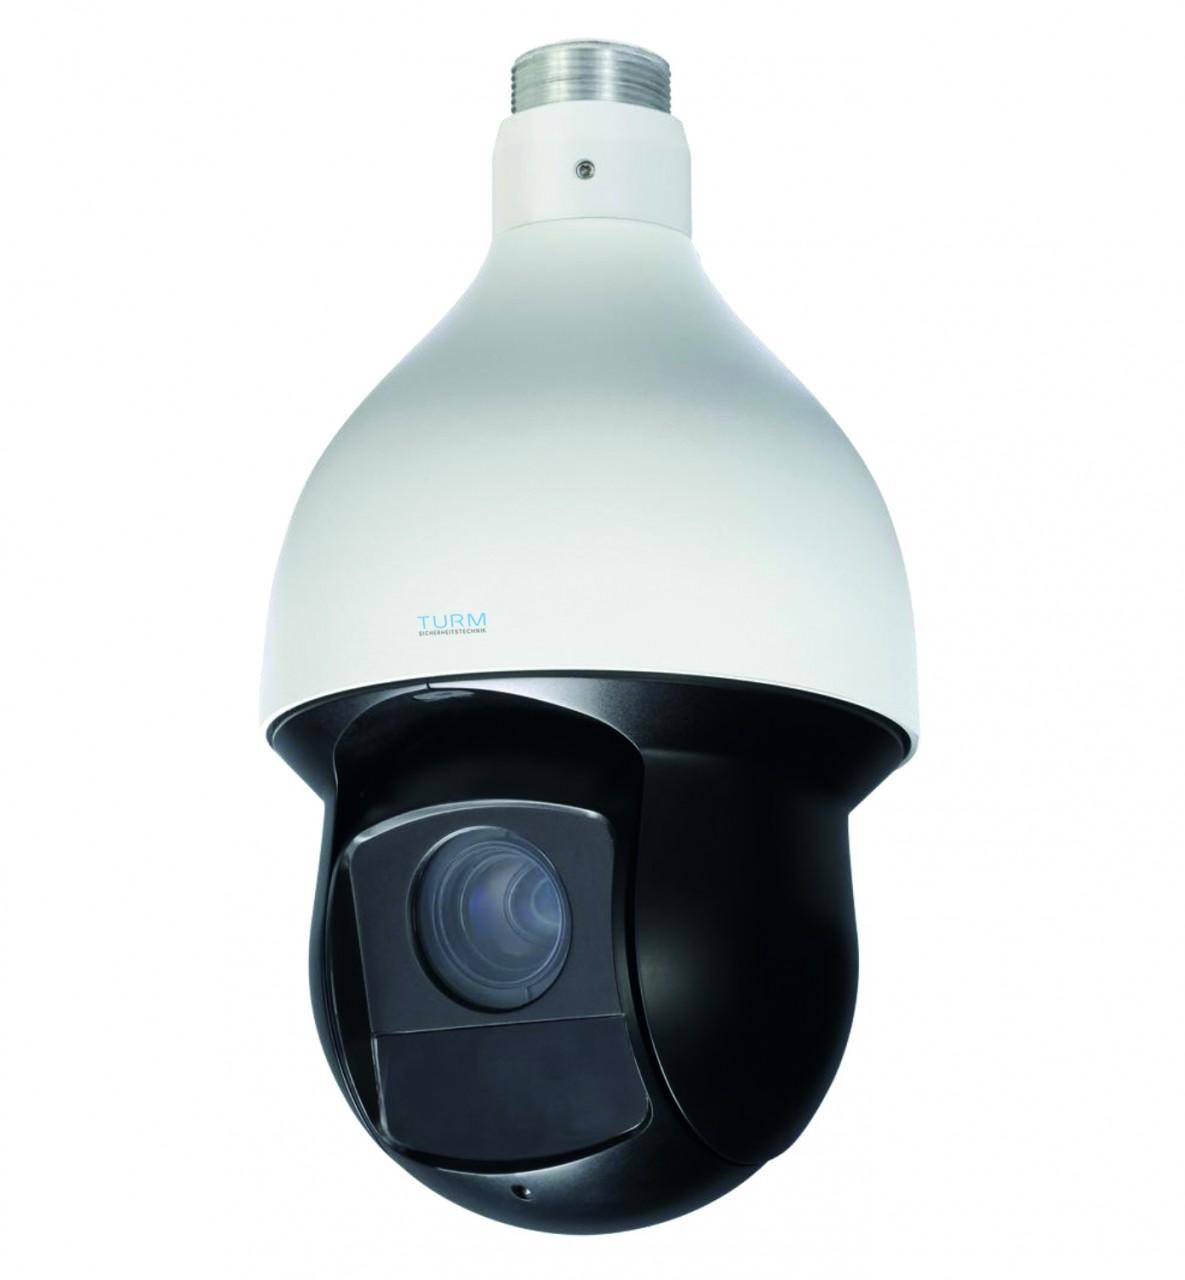 TURM IP Professional 4 MP PTZ Kamera mit Auto Tracking, Intelligentem Videosystem, 30x Zoom und 100m